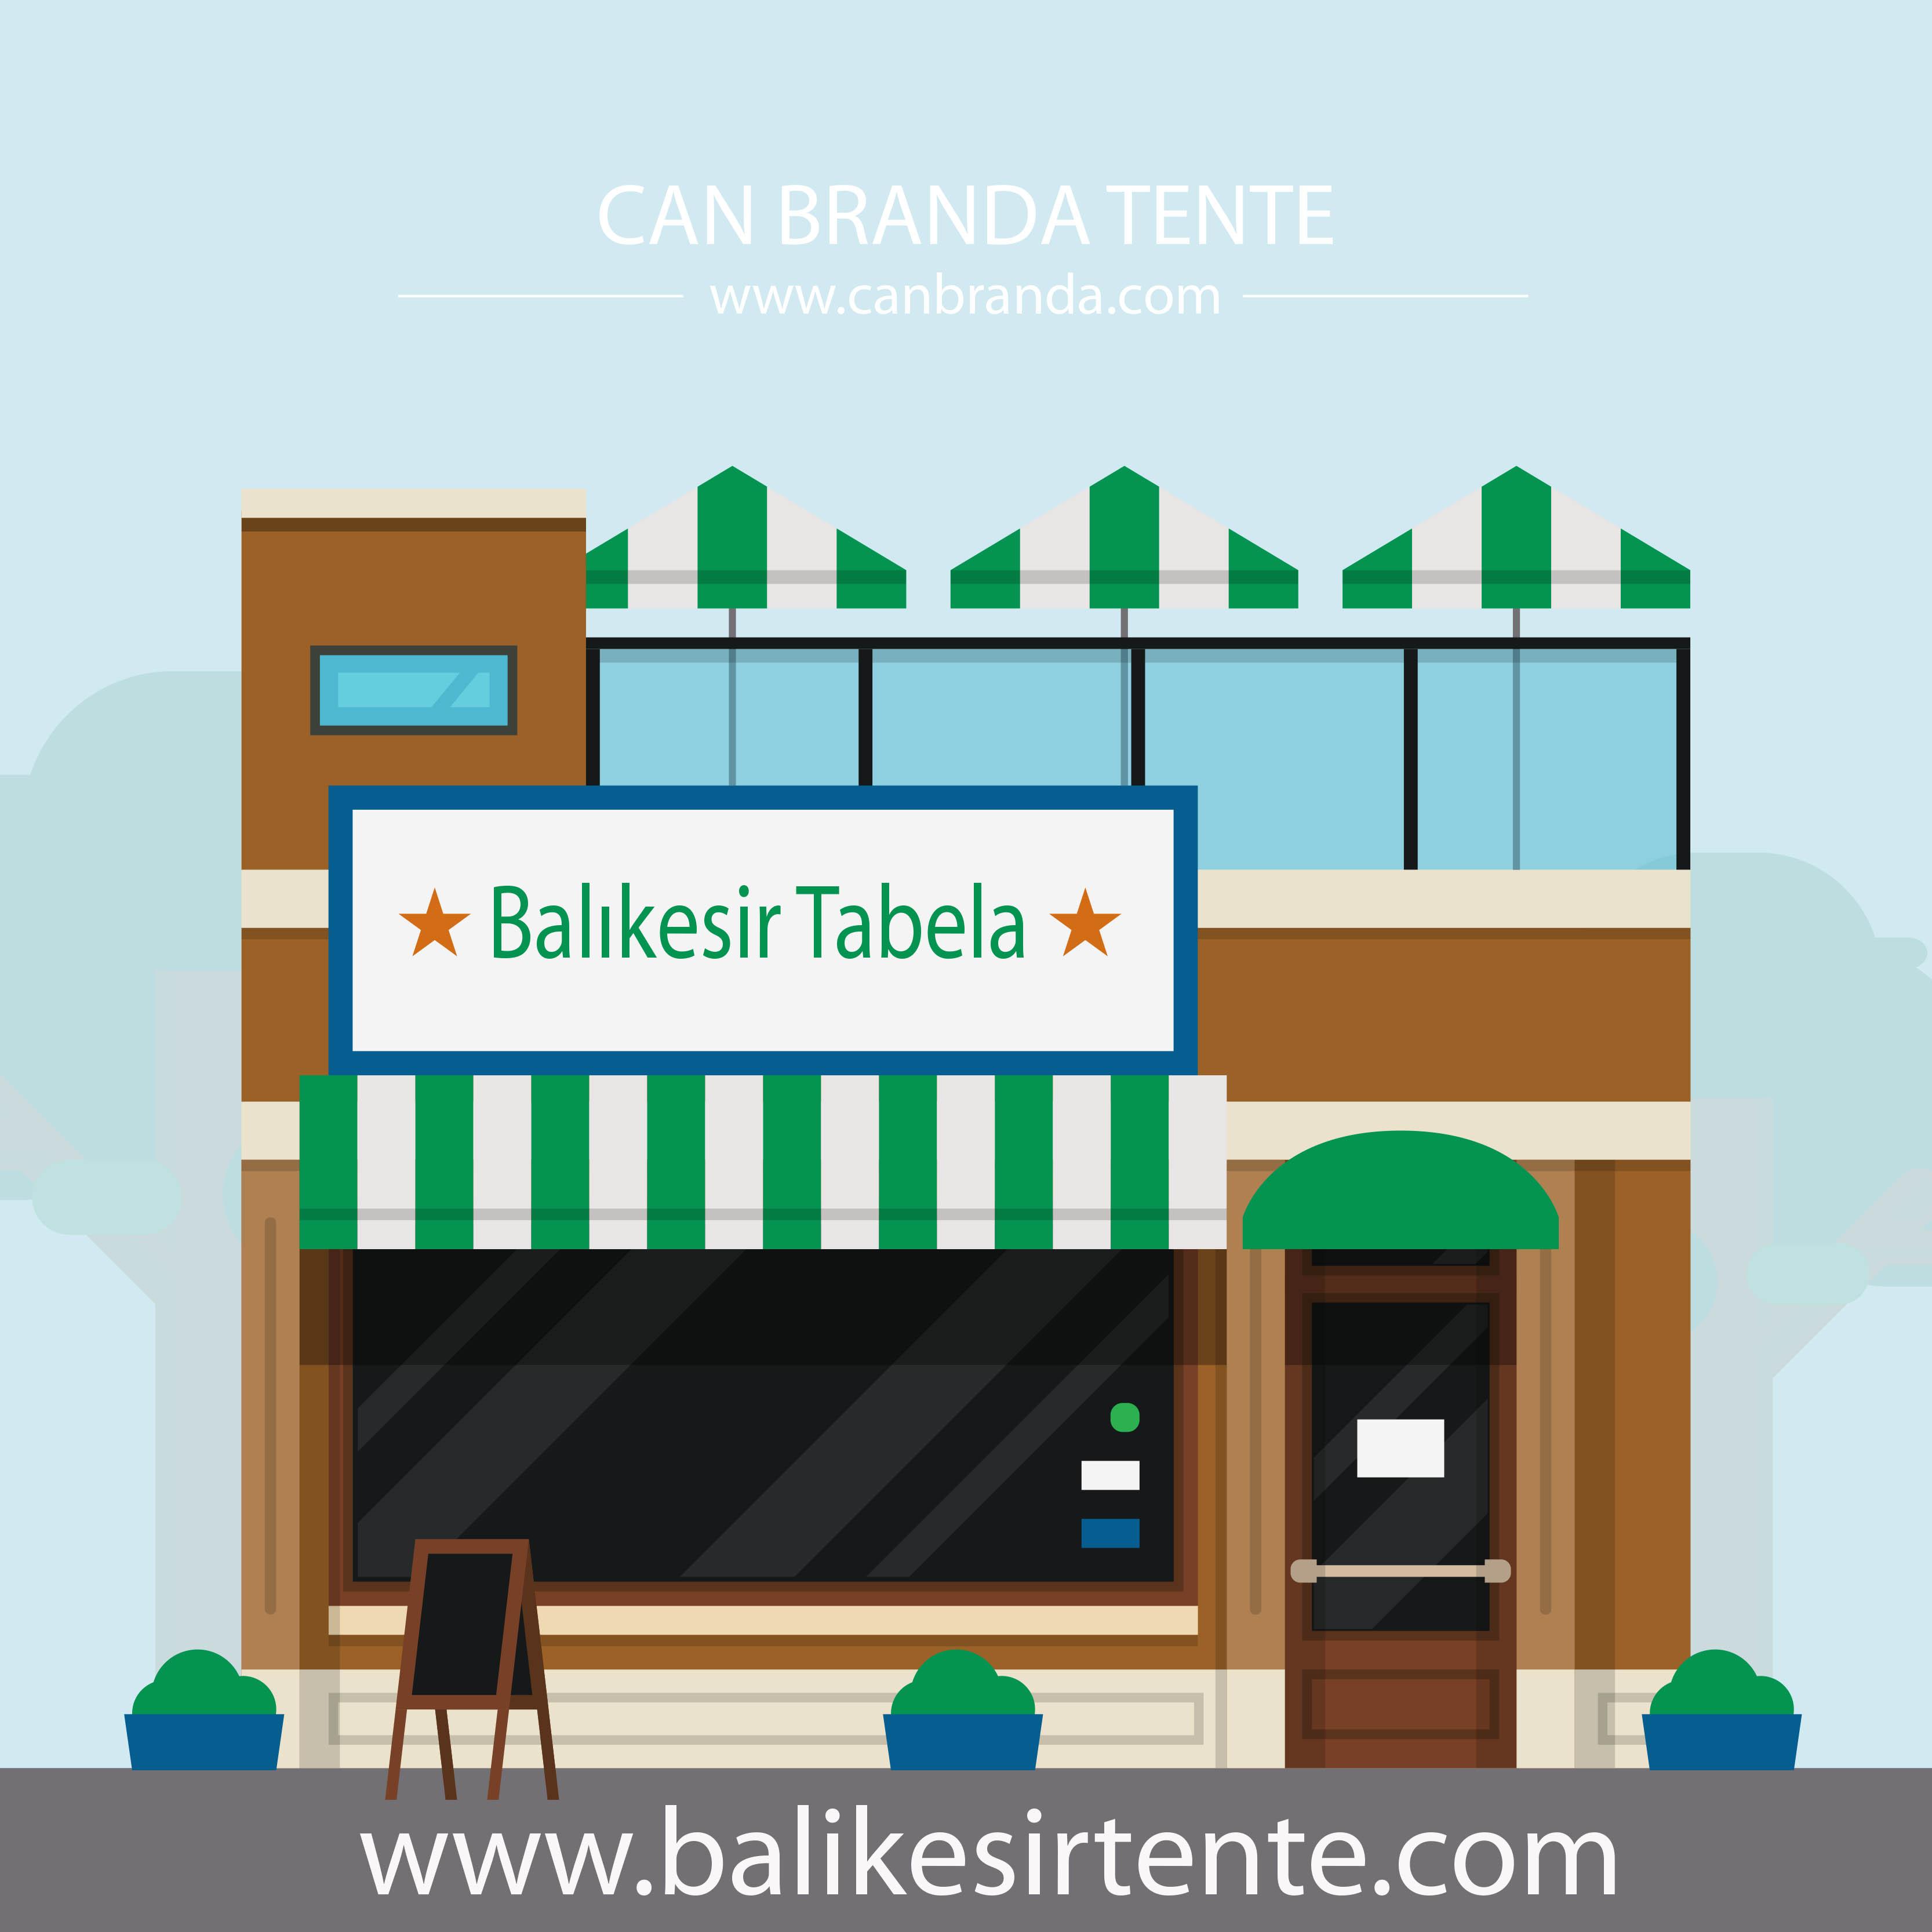 balikesirde-tente-tabela